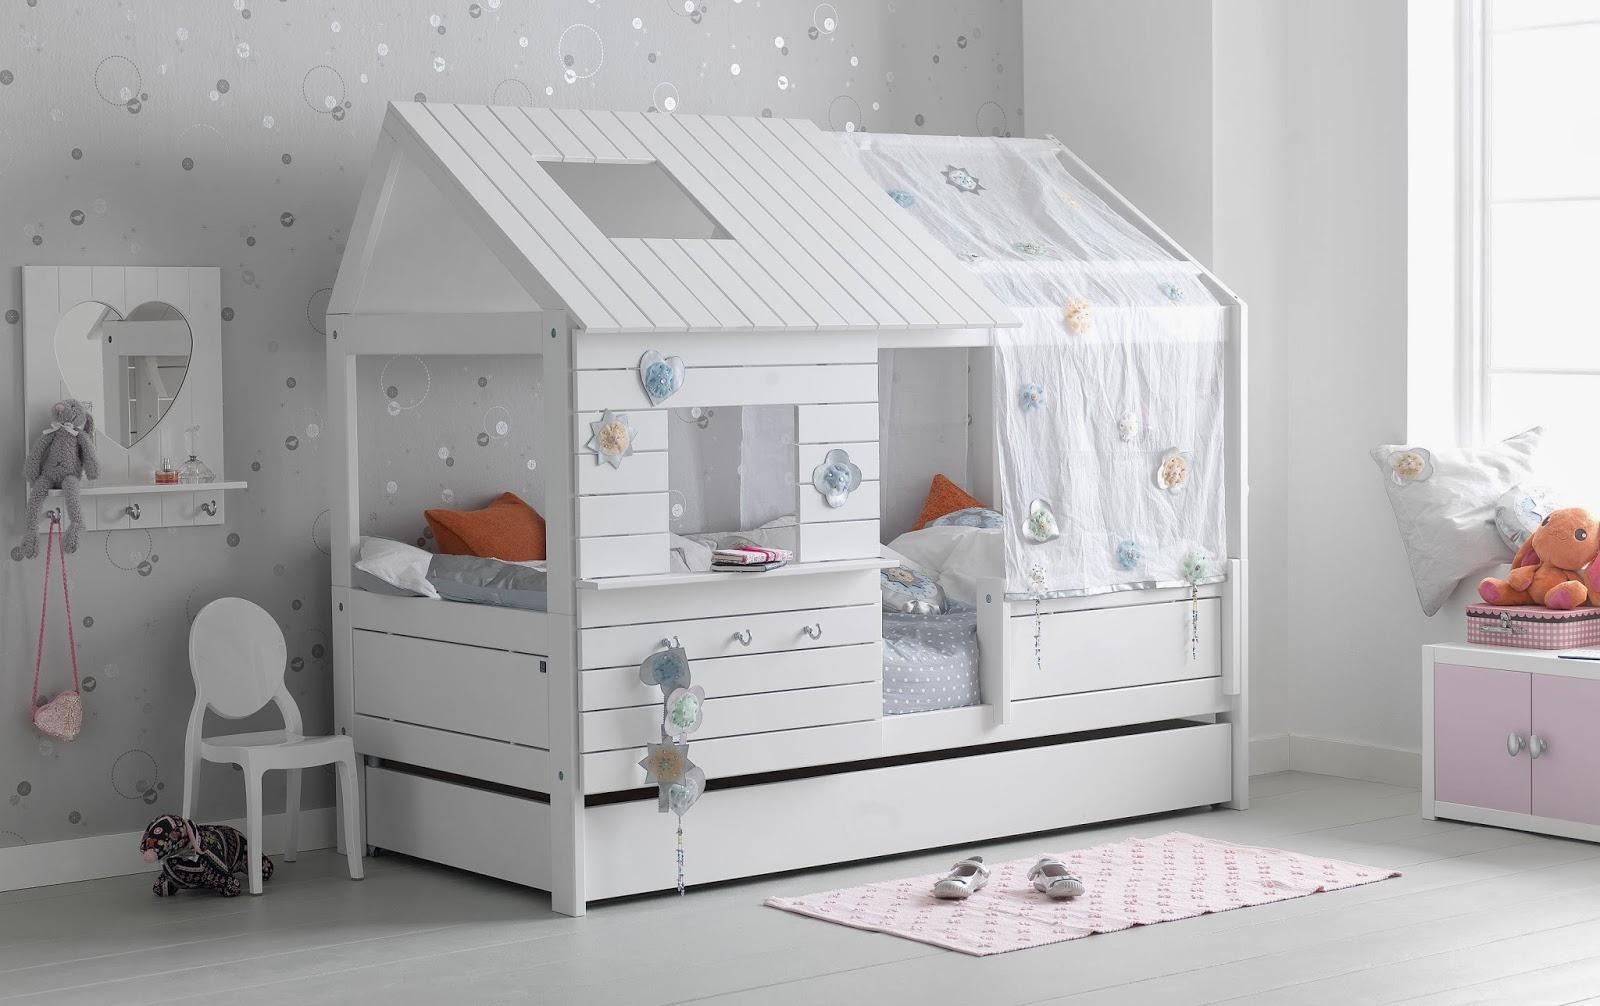 http://www.portobellostreet.es/mueble/27815/Cama-caba%C3%B1a-Infantil-Silversparkle